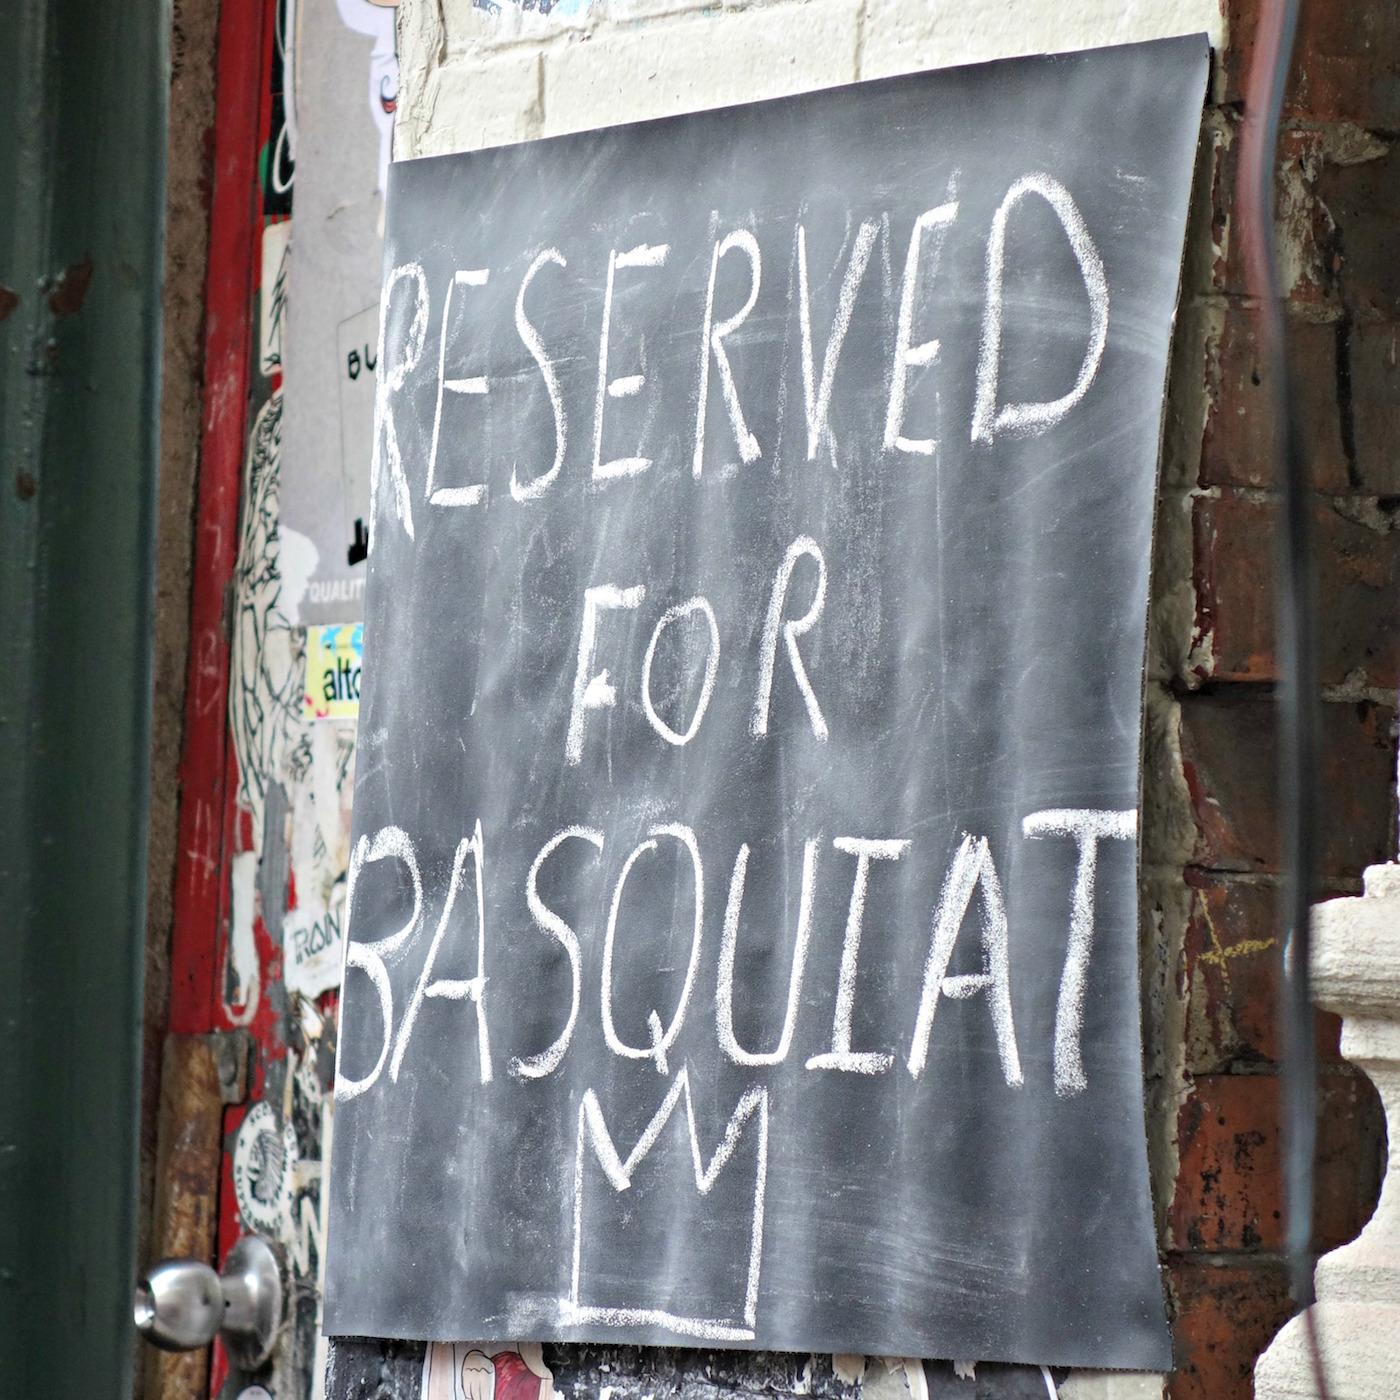 Jean-Michel Basquiat plaque unveiling